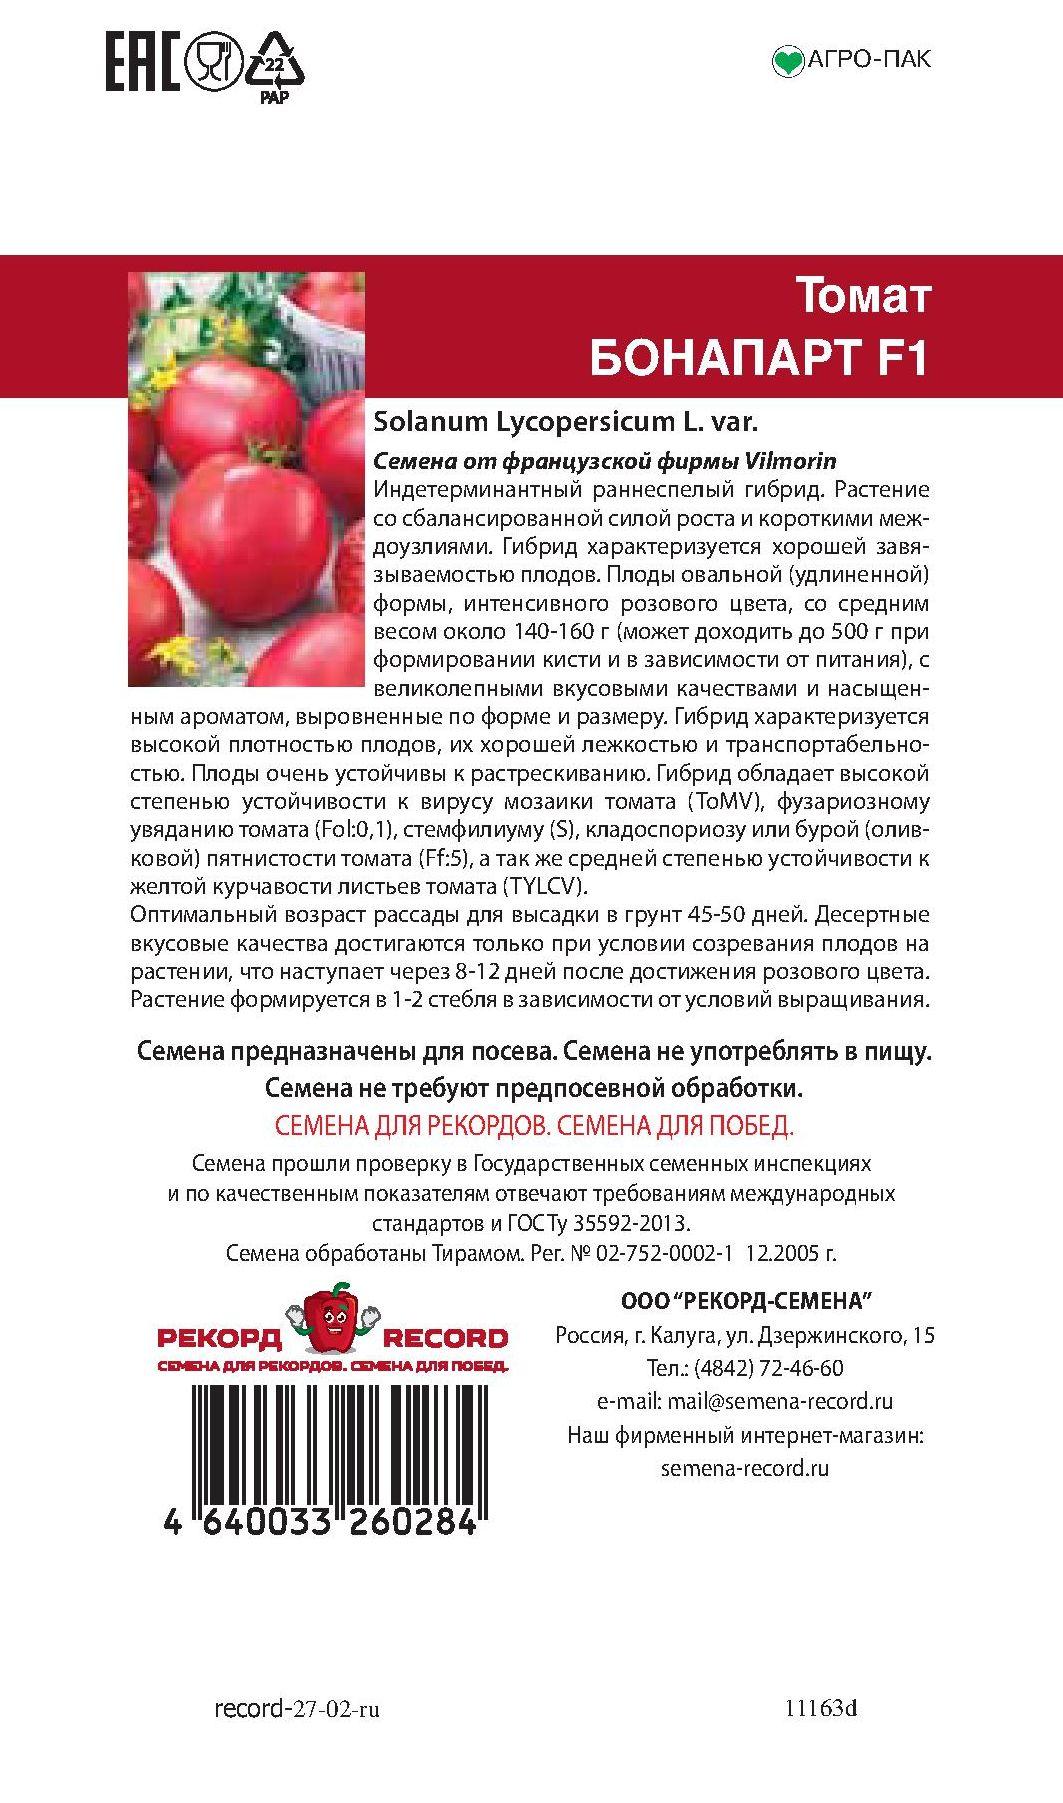 Томат бонапарт f1 — описание и характеристика сорта   zdavnews.ru